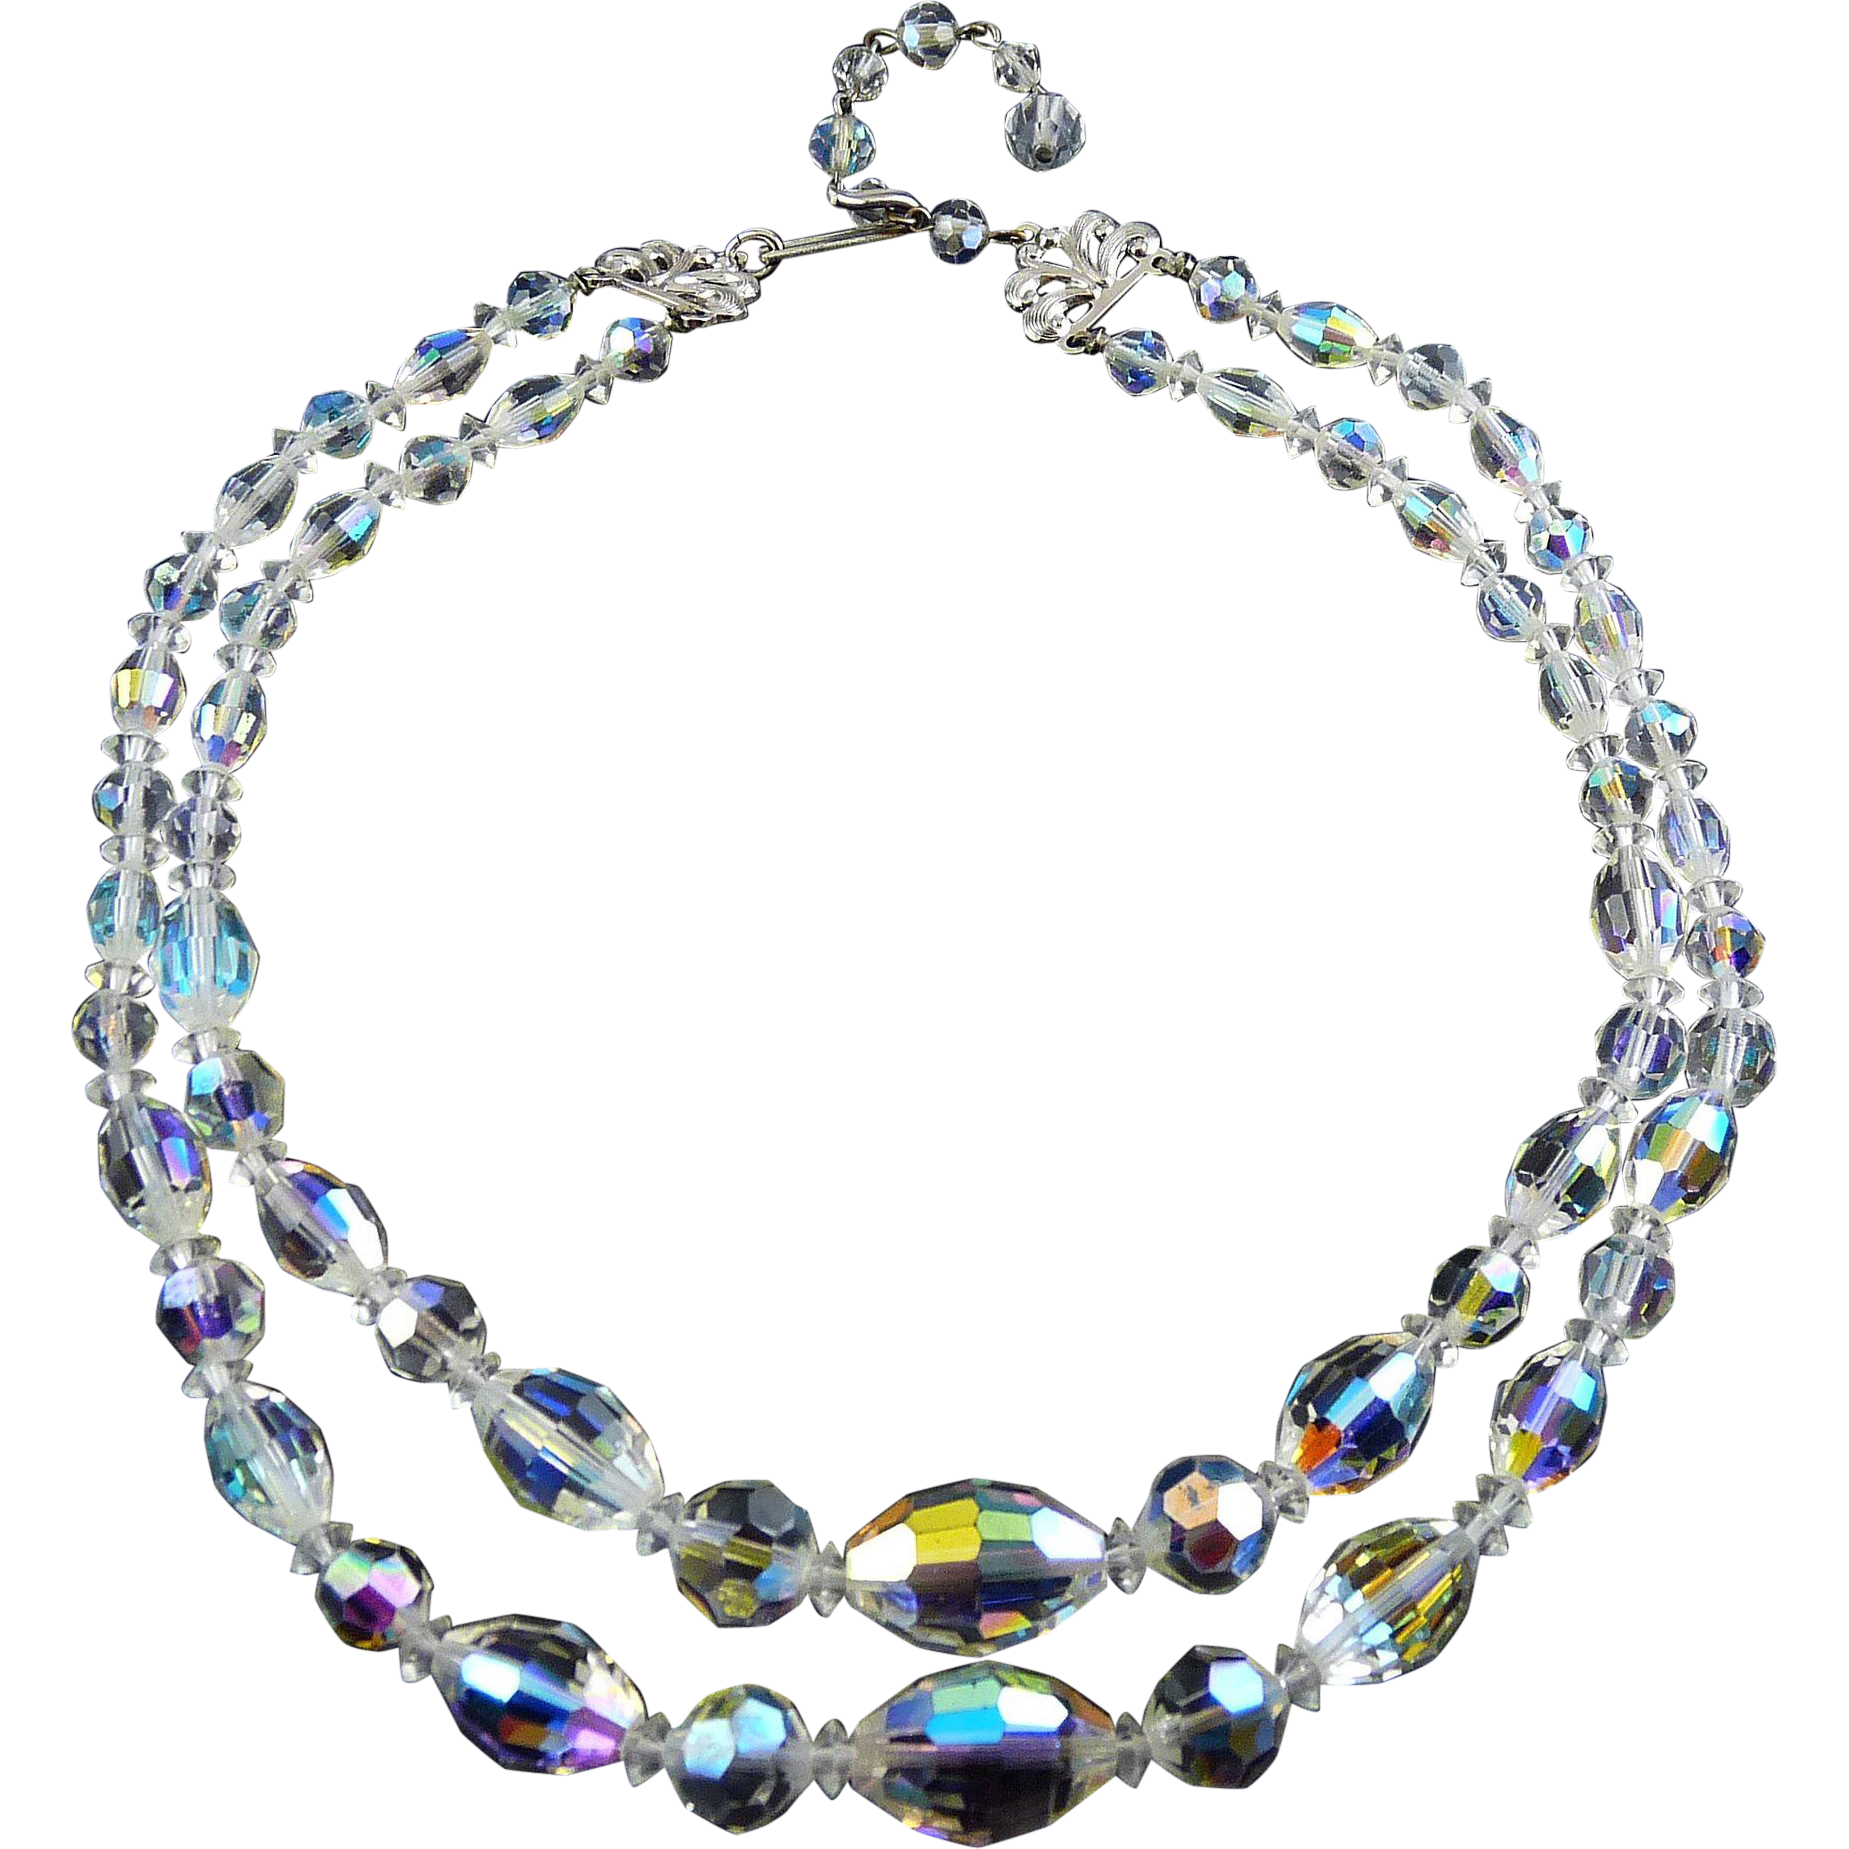 Swarovski Oval 5200 Shape AB Crystal Graduated Beads 2-Strand Necklace